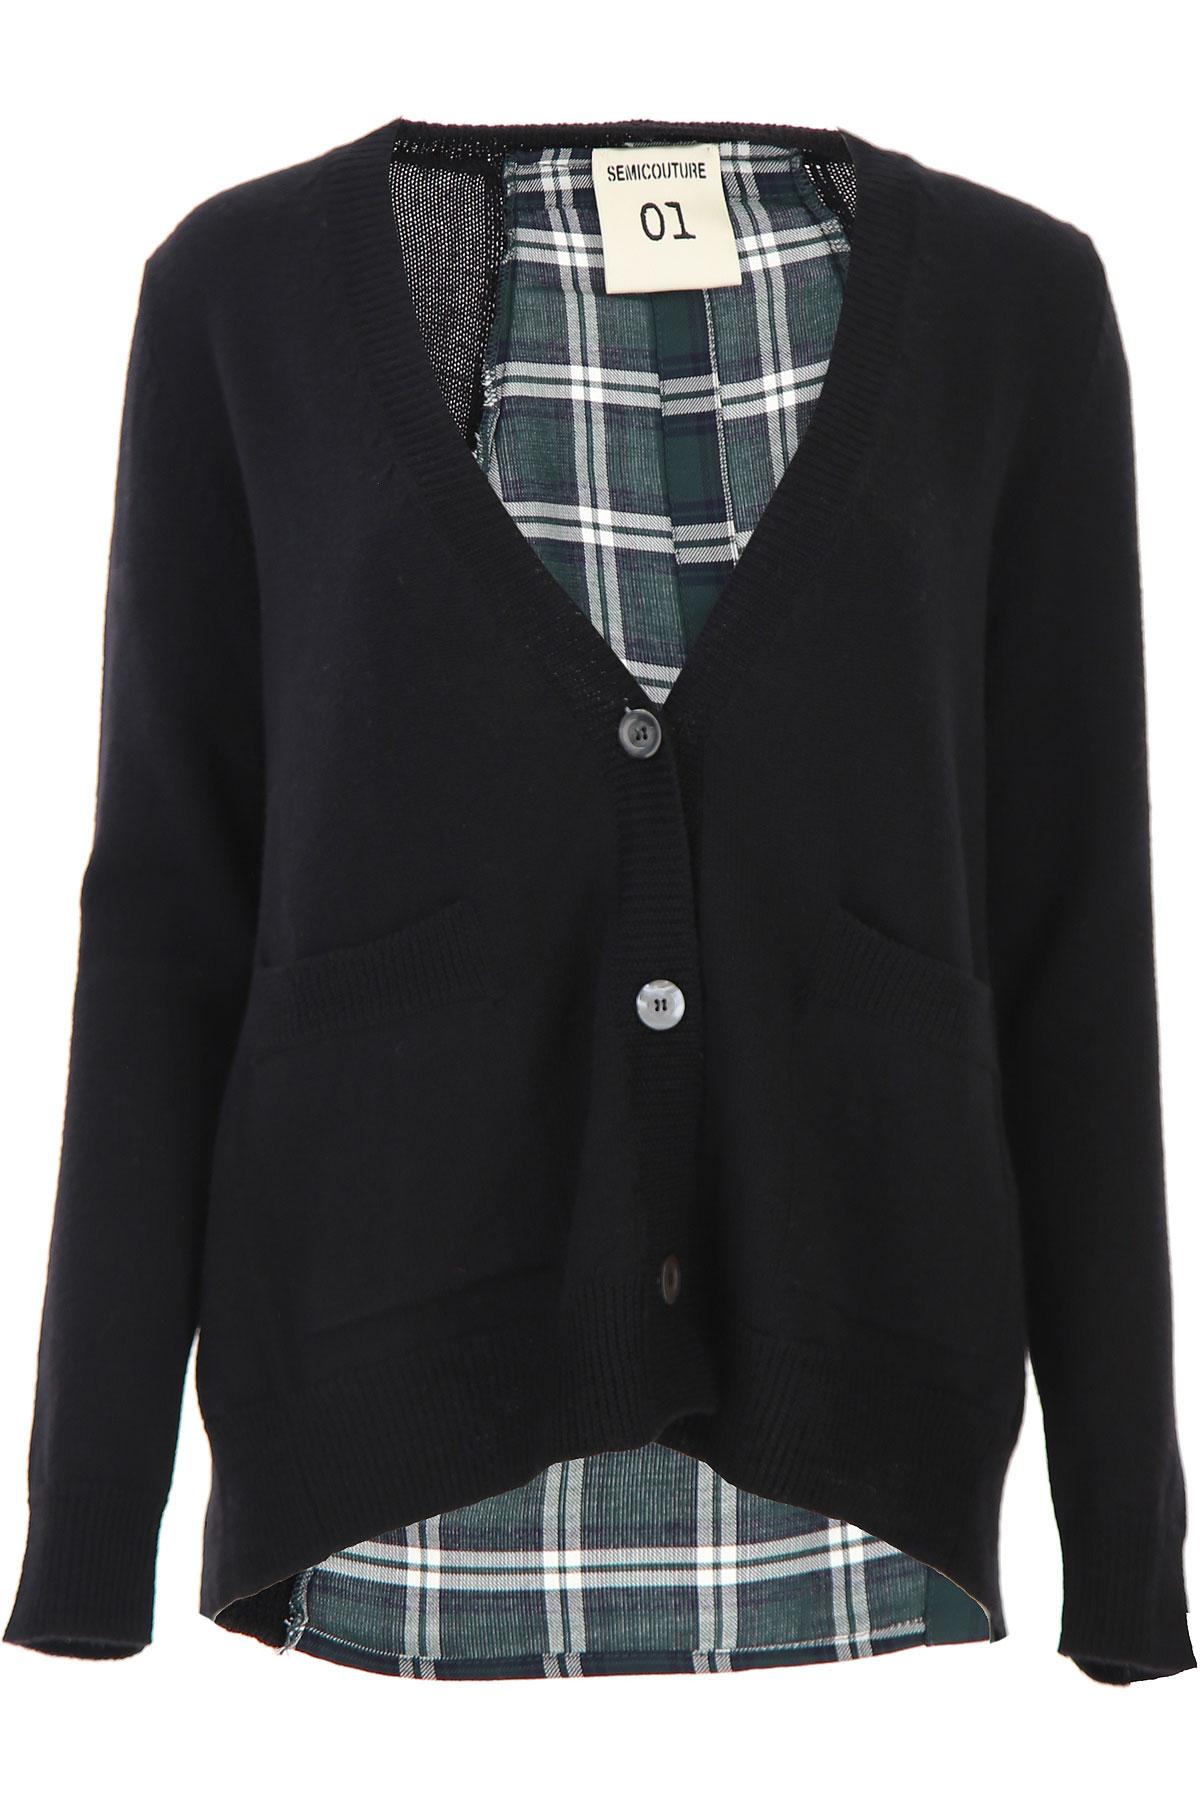 Semicouture Sweater for Women Jumper On Sale, Black, Virgin wool, 2019, 2 6